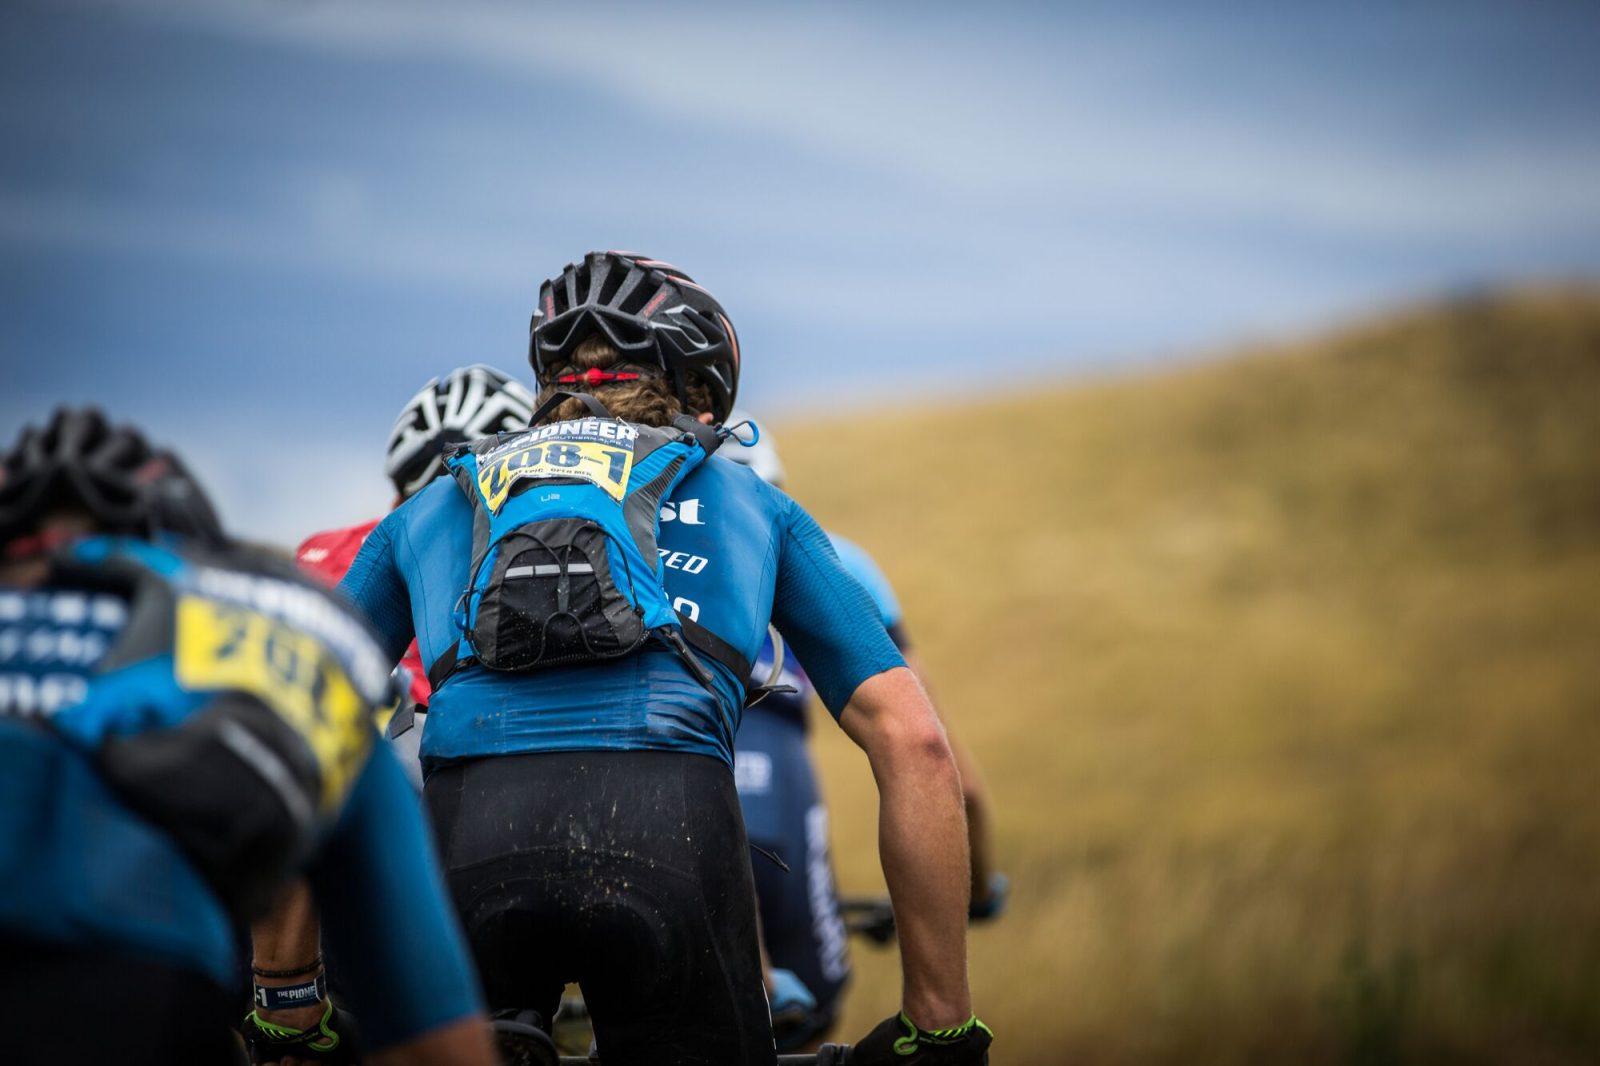 cyclistd2-3